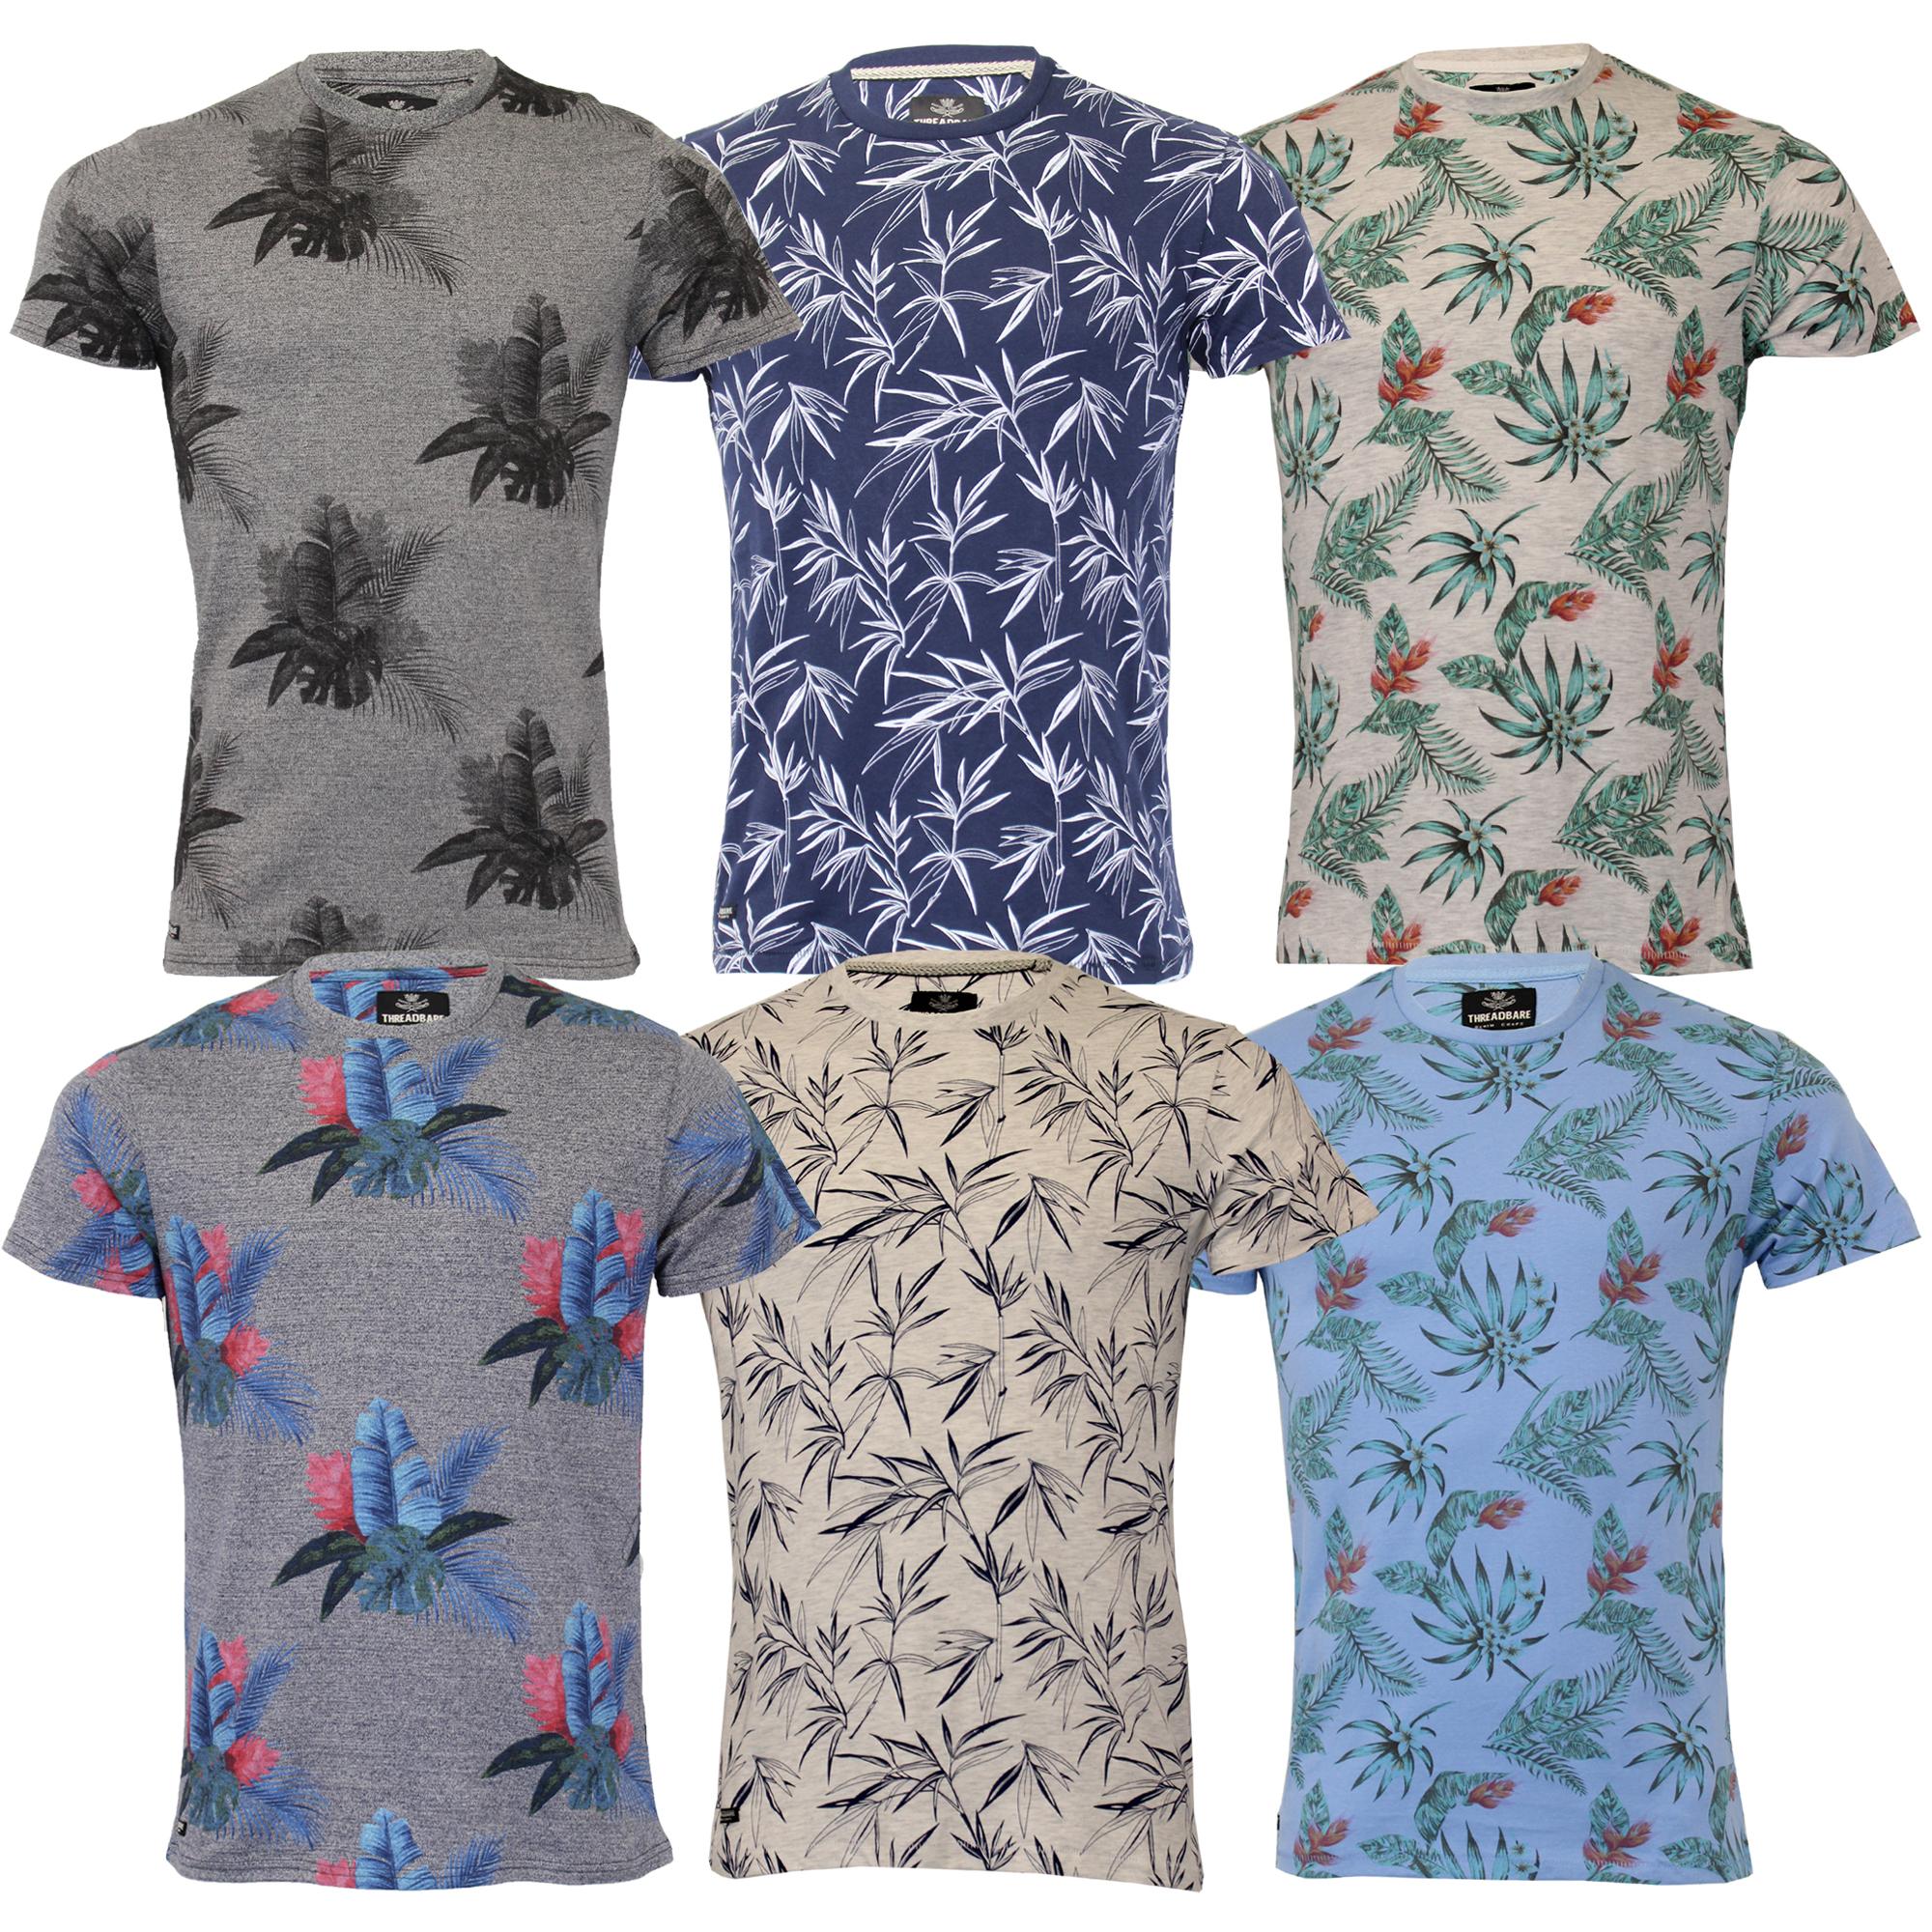 Mens Hawaii Shirt Threadbare Floral Print Short Sleeved Beach Holiday Summer New